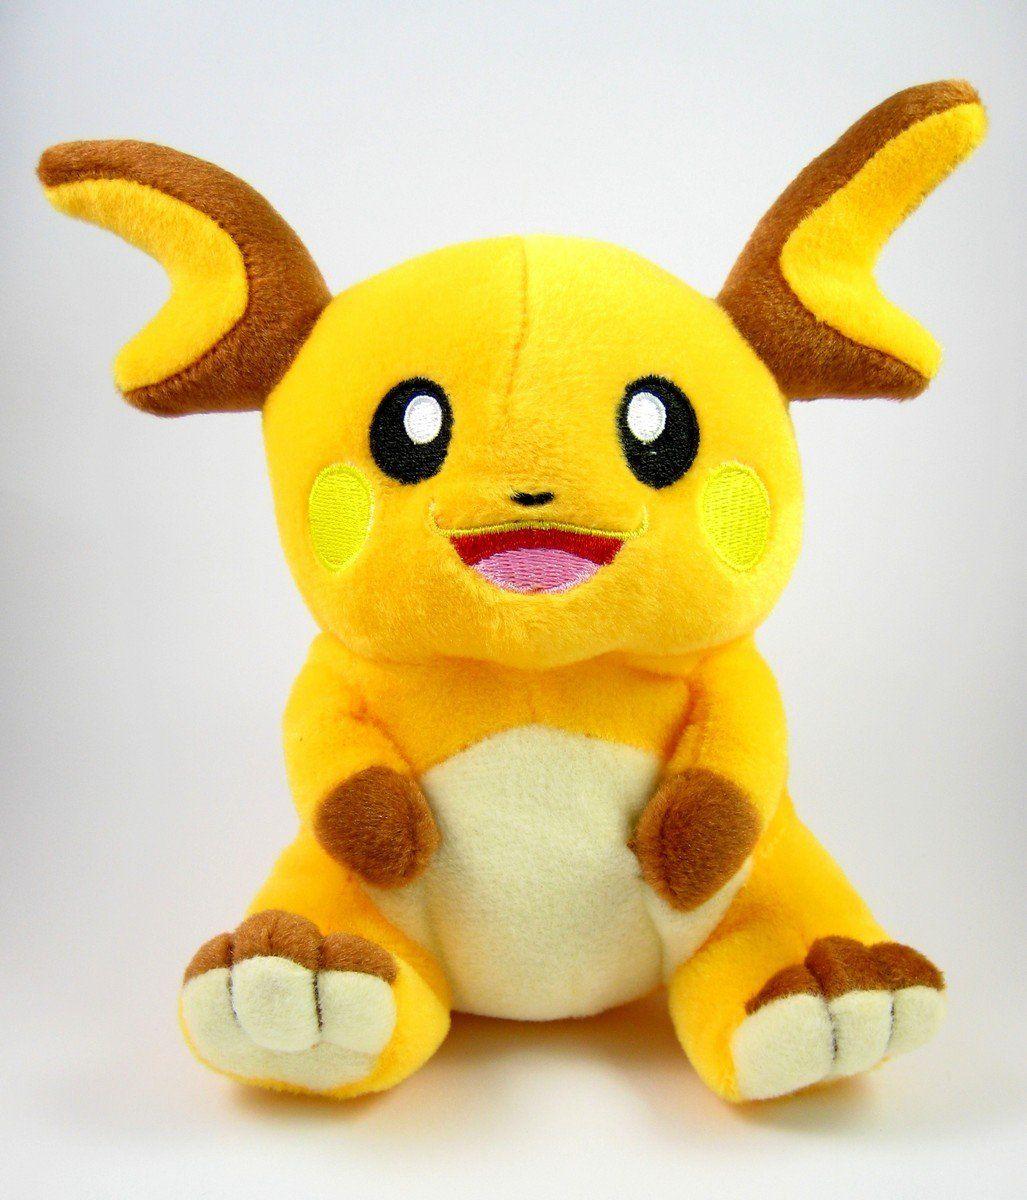 Inspiration for face Pokemon Plush Raichu